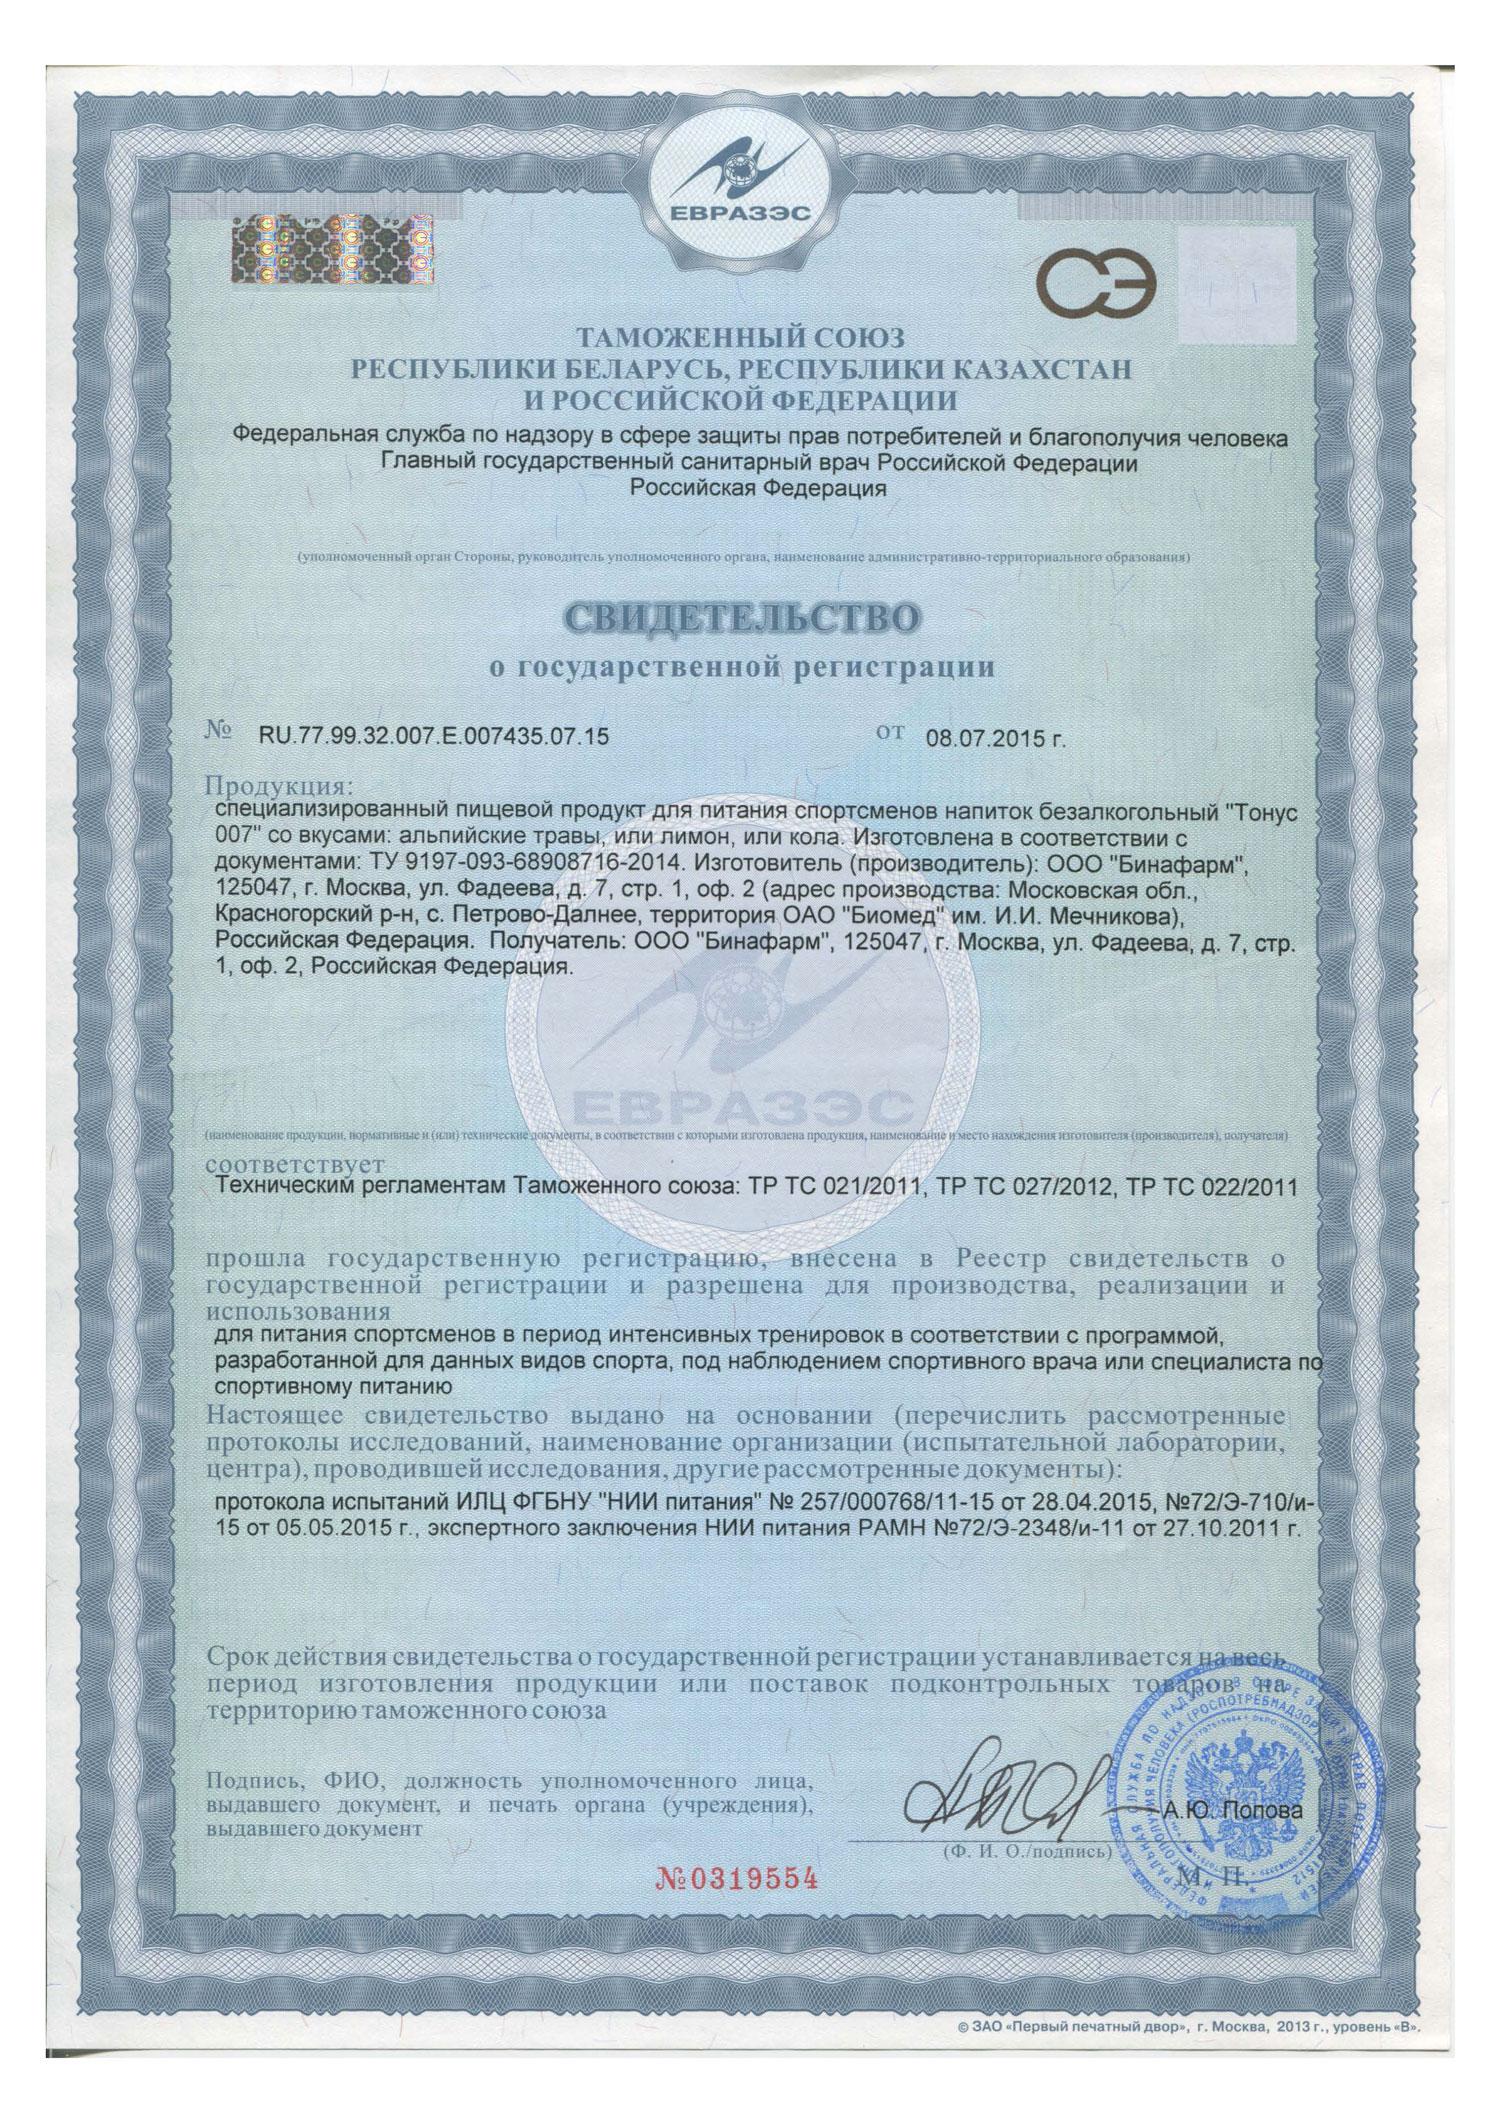 Сертификат 007 Profi